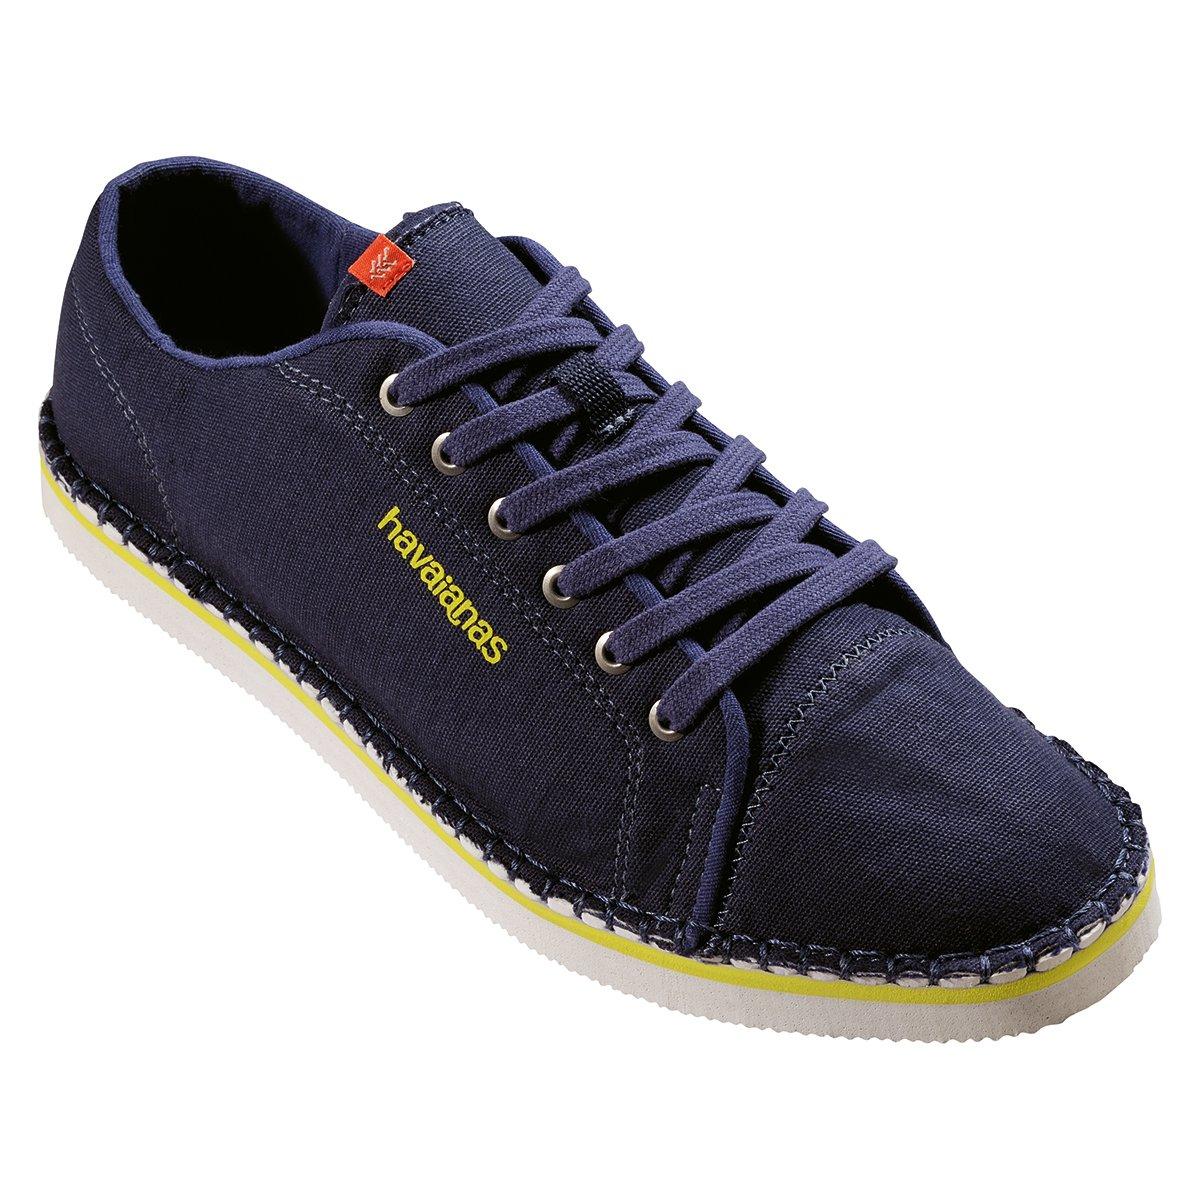 c75d0b4251d Alpargatas Havaianas Sneaker Layers Iii - Compre Agora